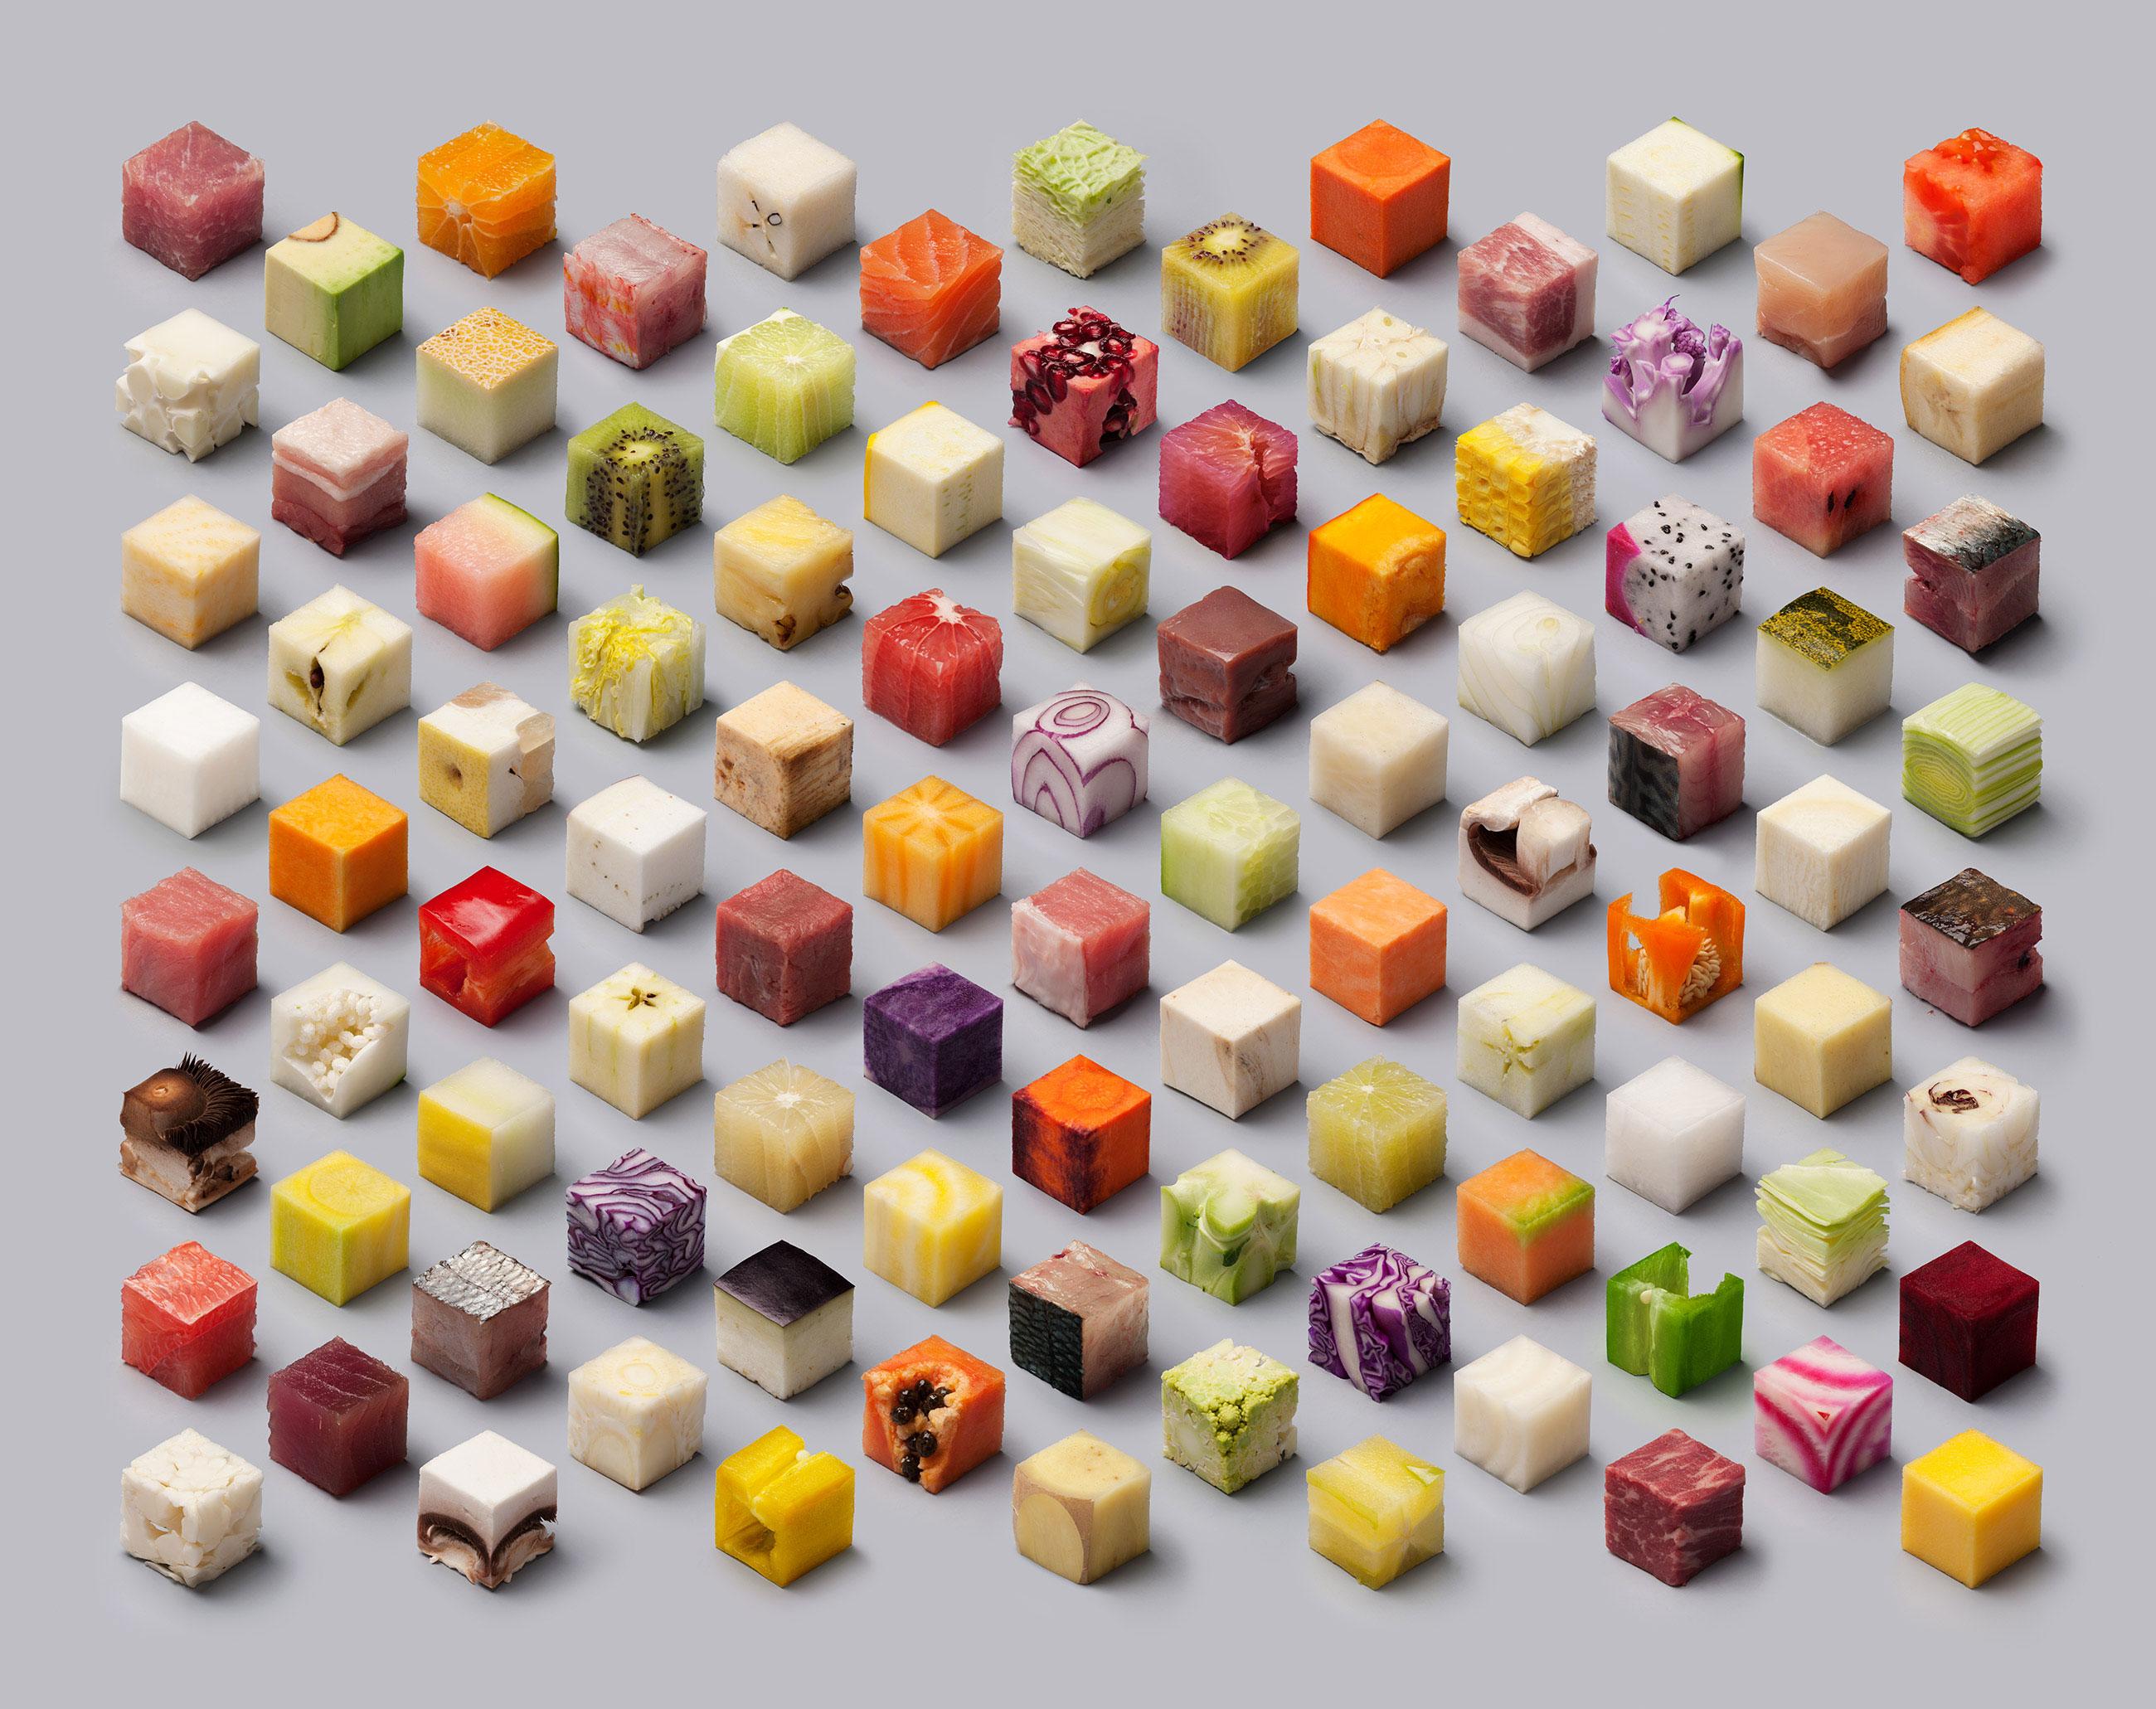 Image Cubes de nourriture